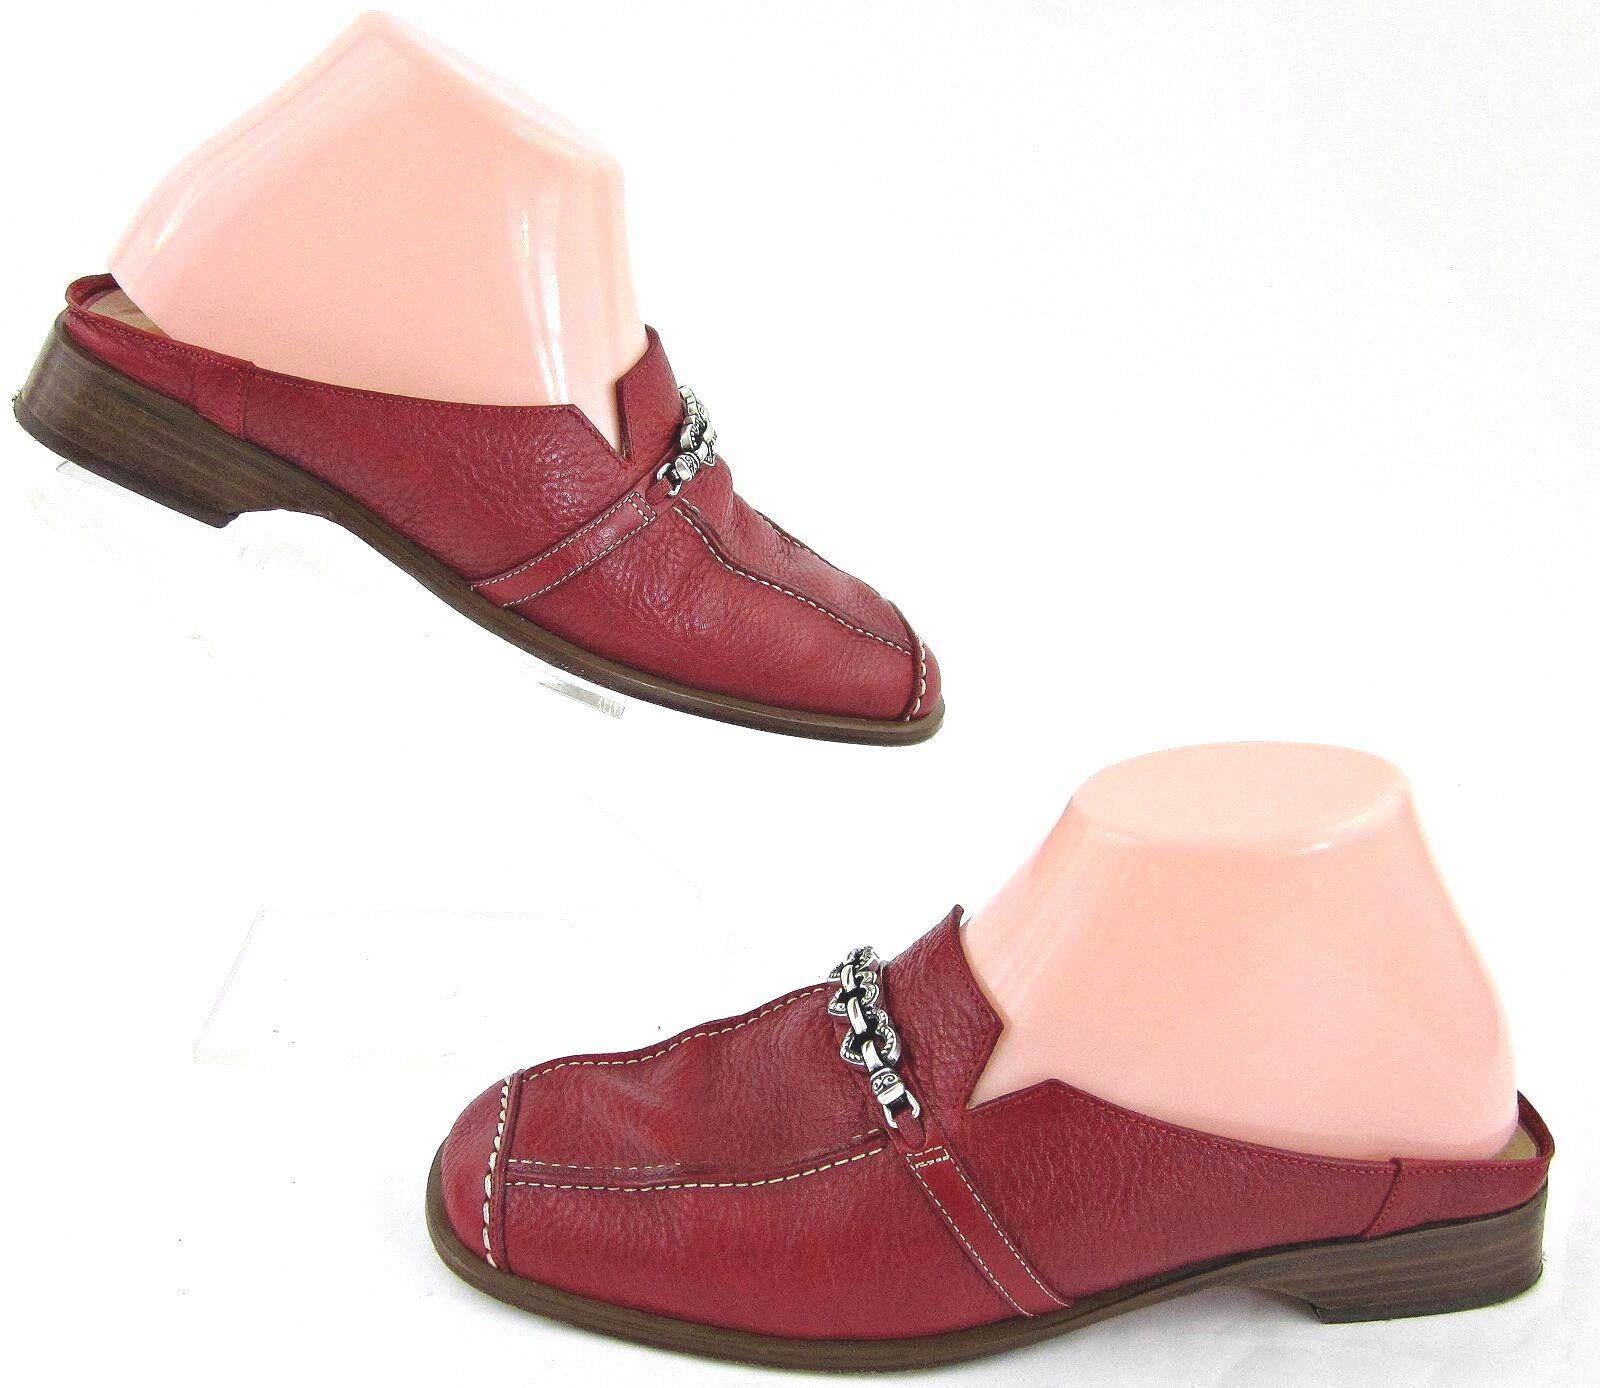 Brighton 'Josie' Low Heel Slide Mules Red Leather Sz 7M Made In